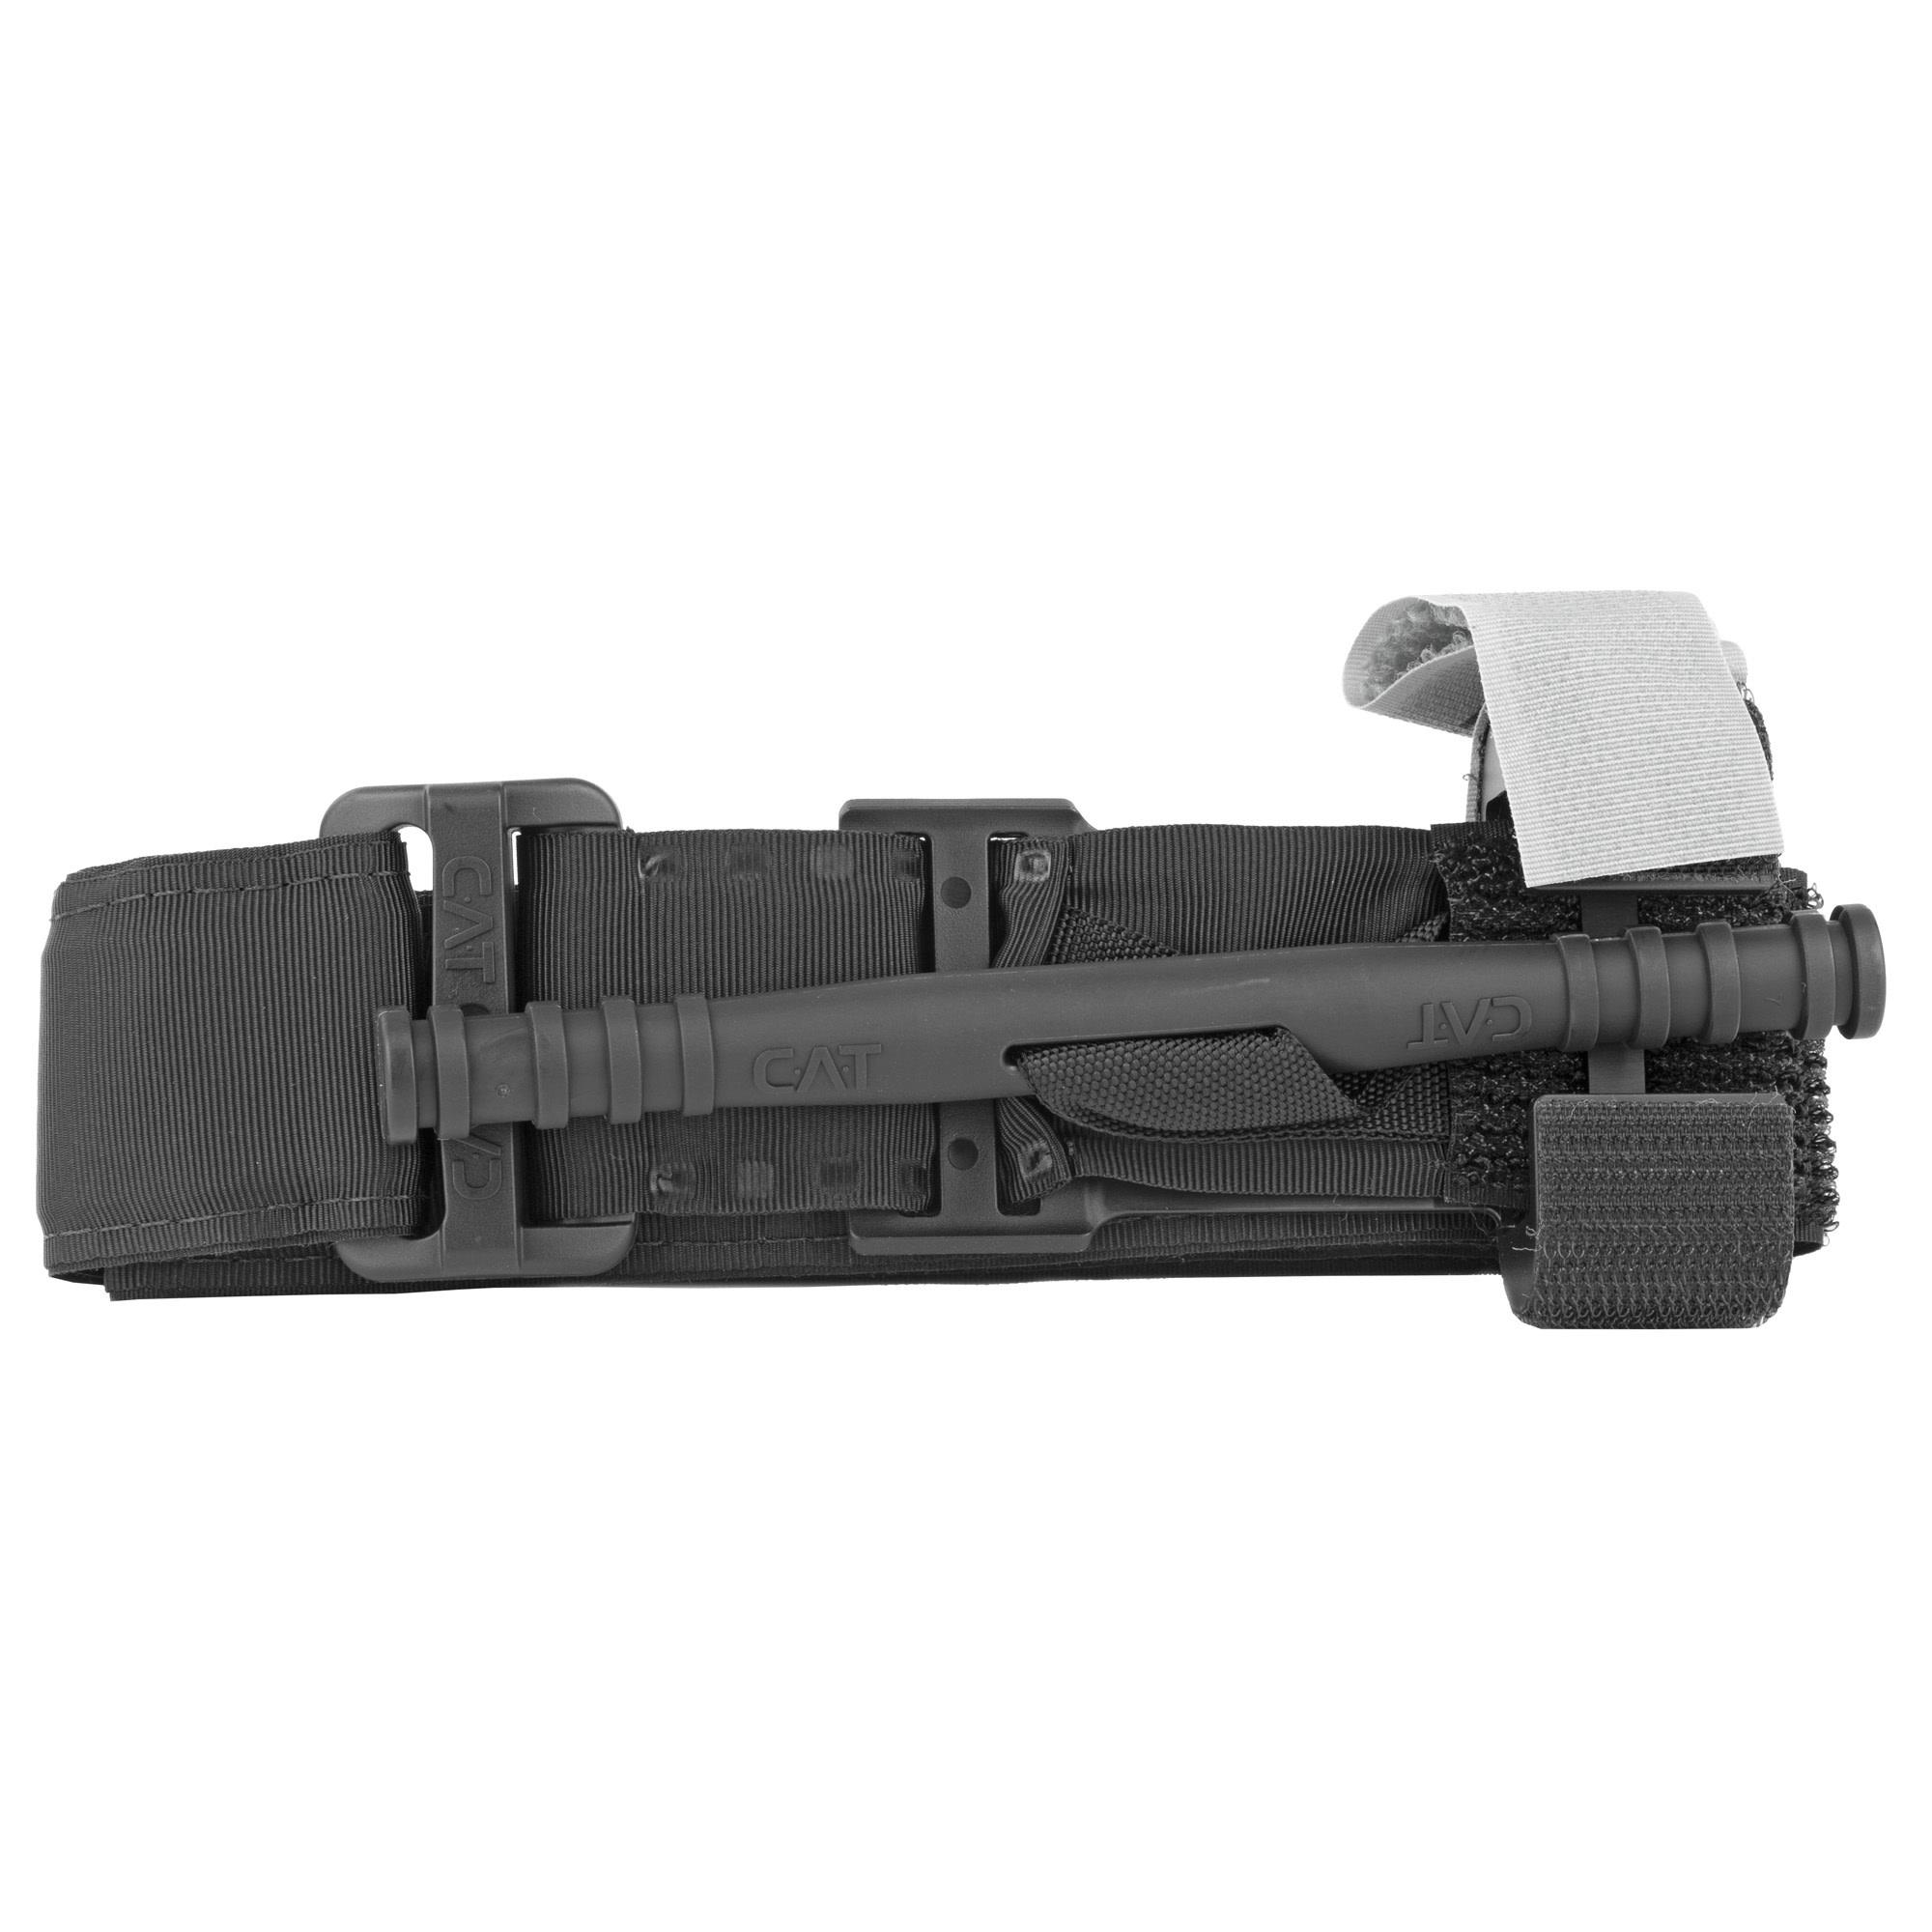 10/14 - Gun Shot Trauma Class - 6pm to 8pm